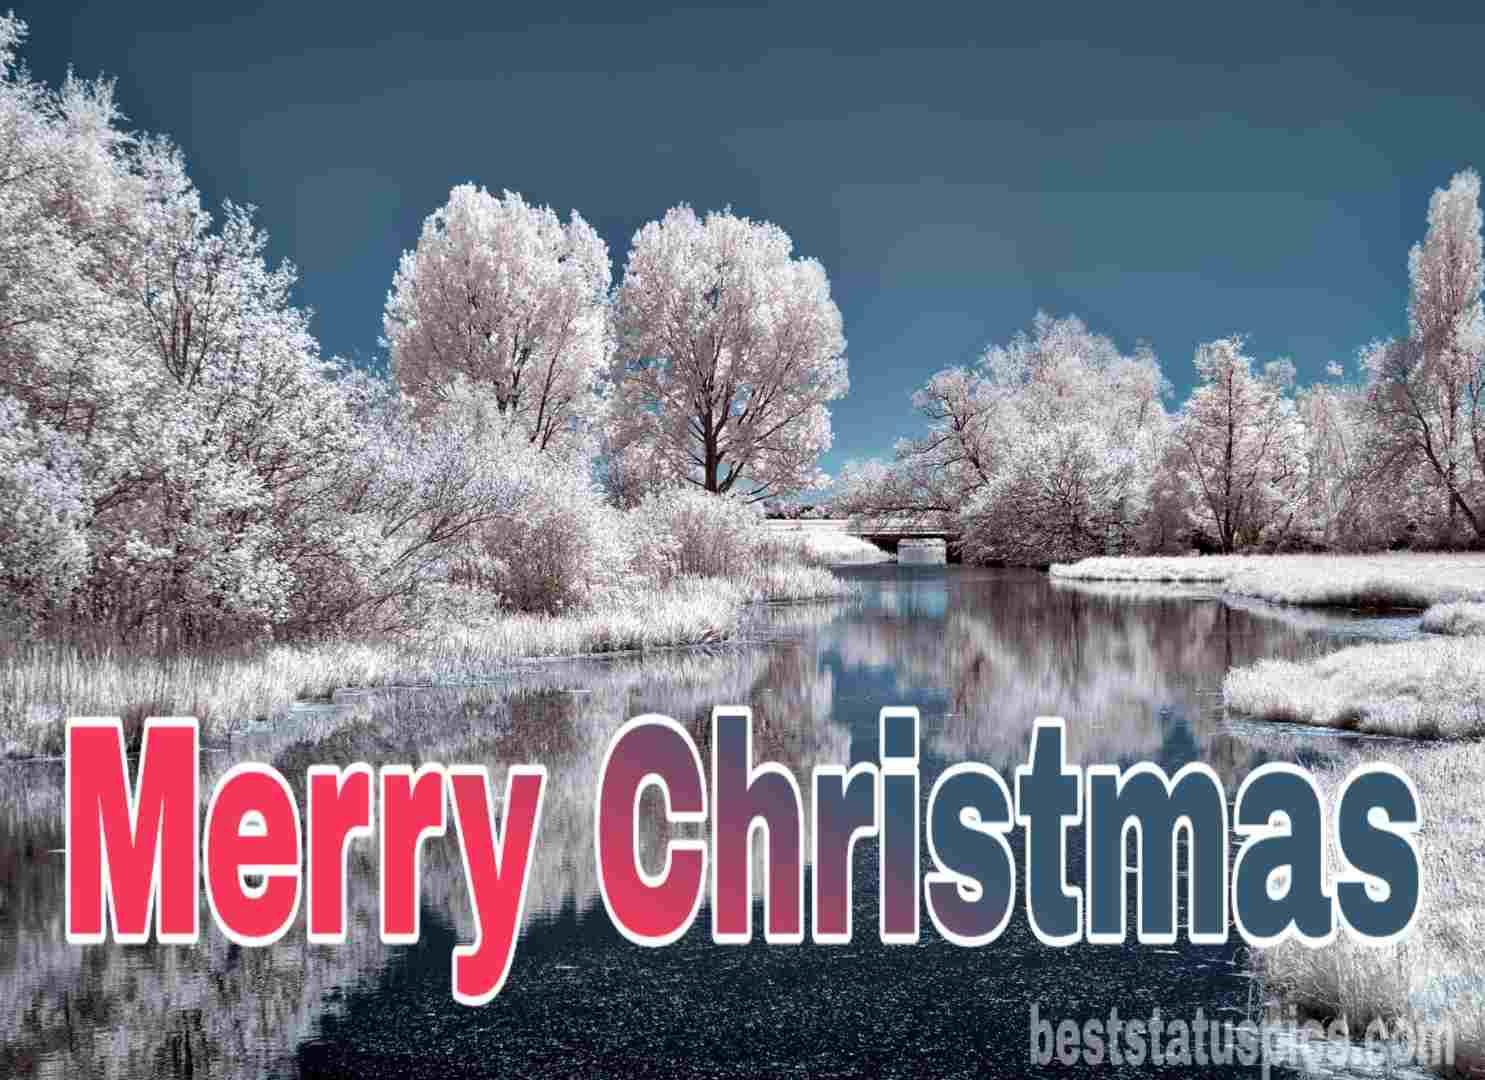 Merry Christmas 2019 Image Whatsapp Dp